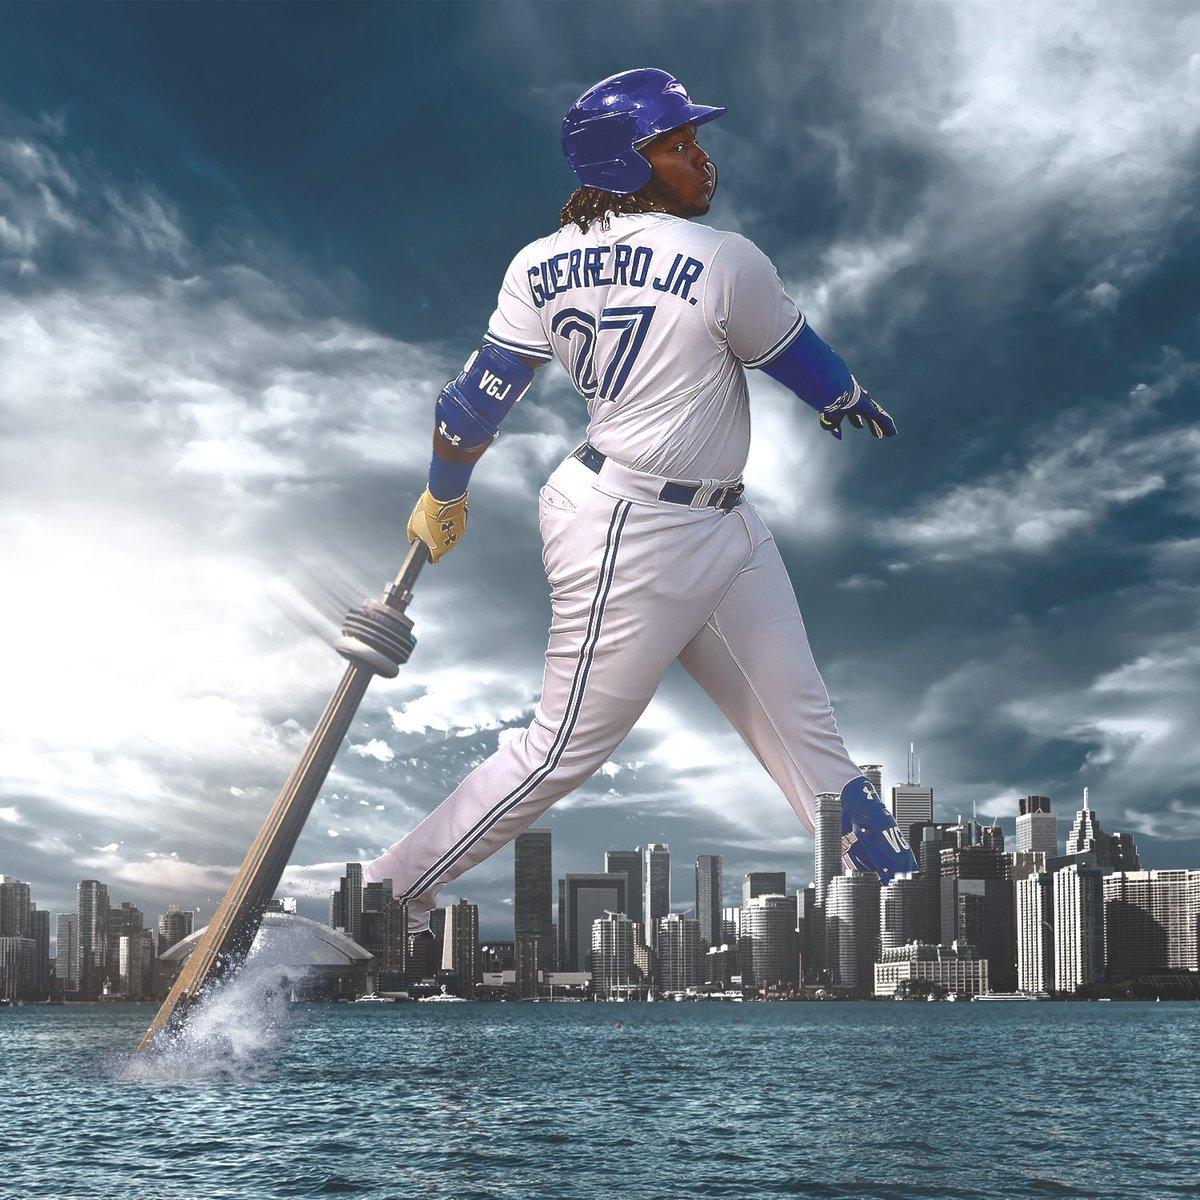 MLB's photo on Vlad Jr.